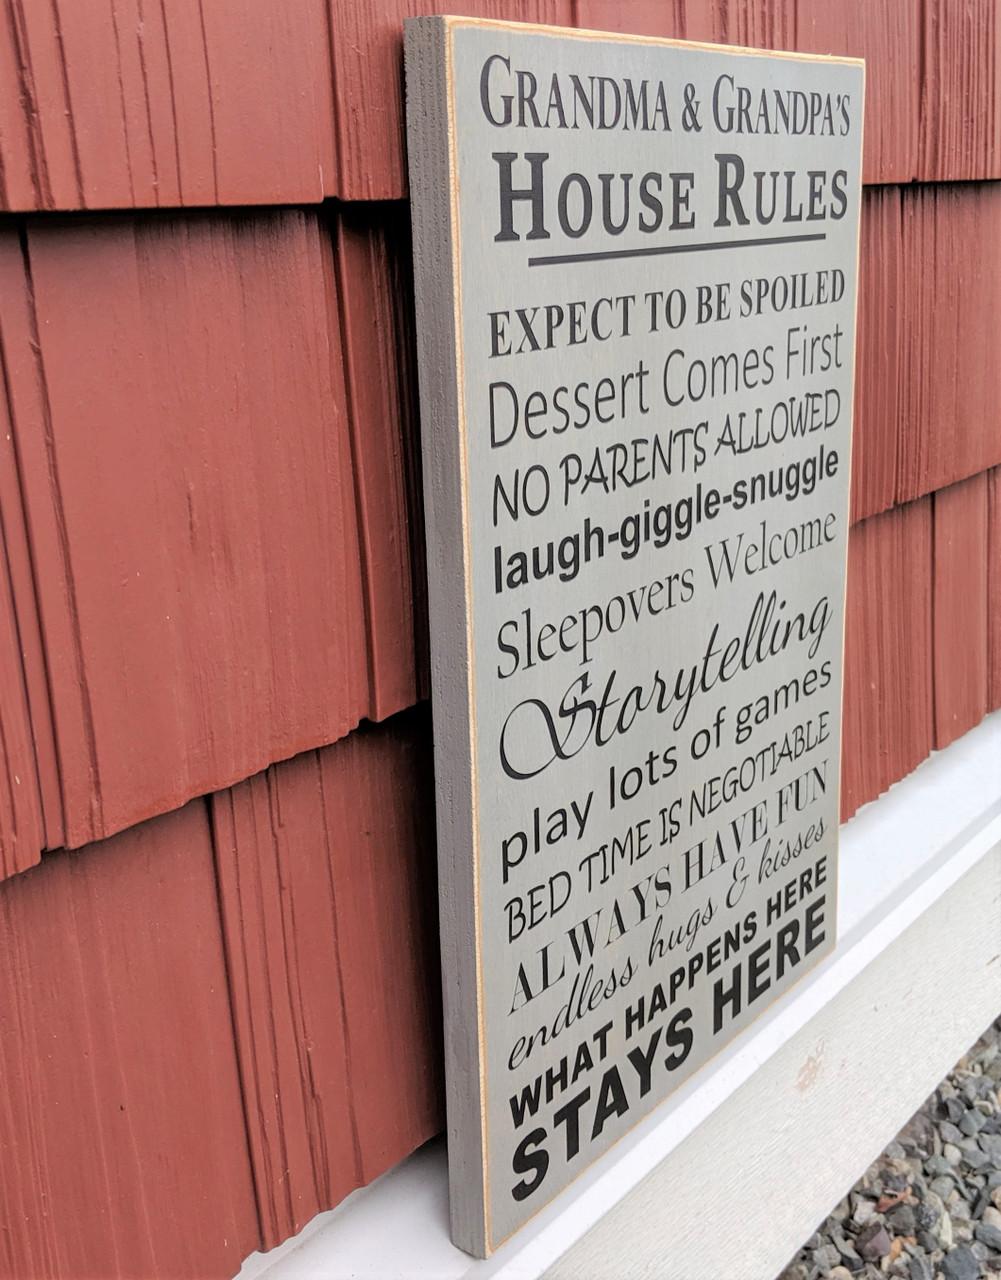 Grandpa & Grandma's House Rules Sign - Side View